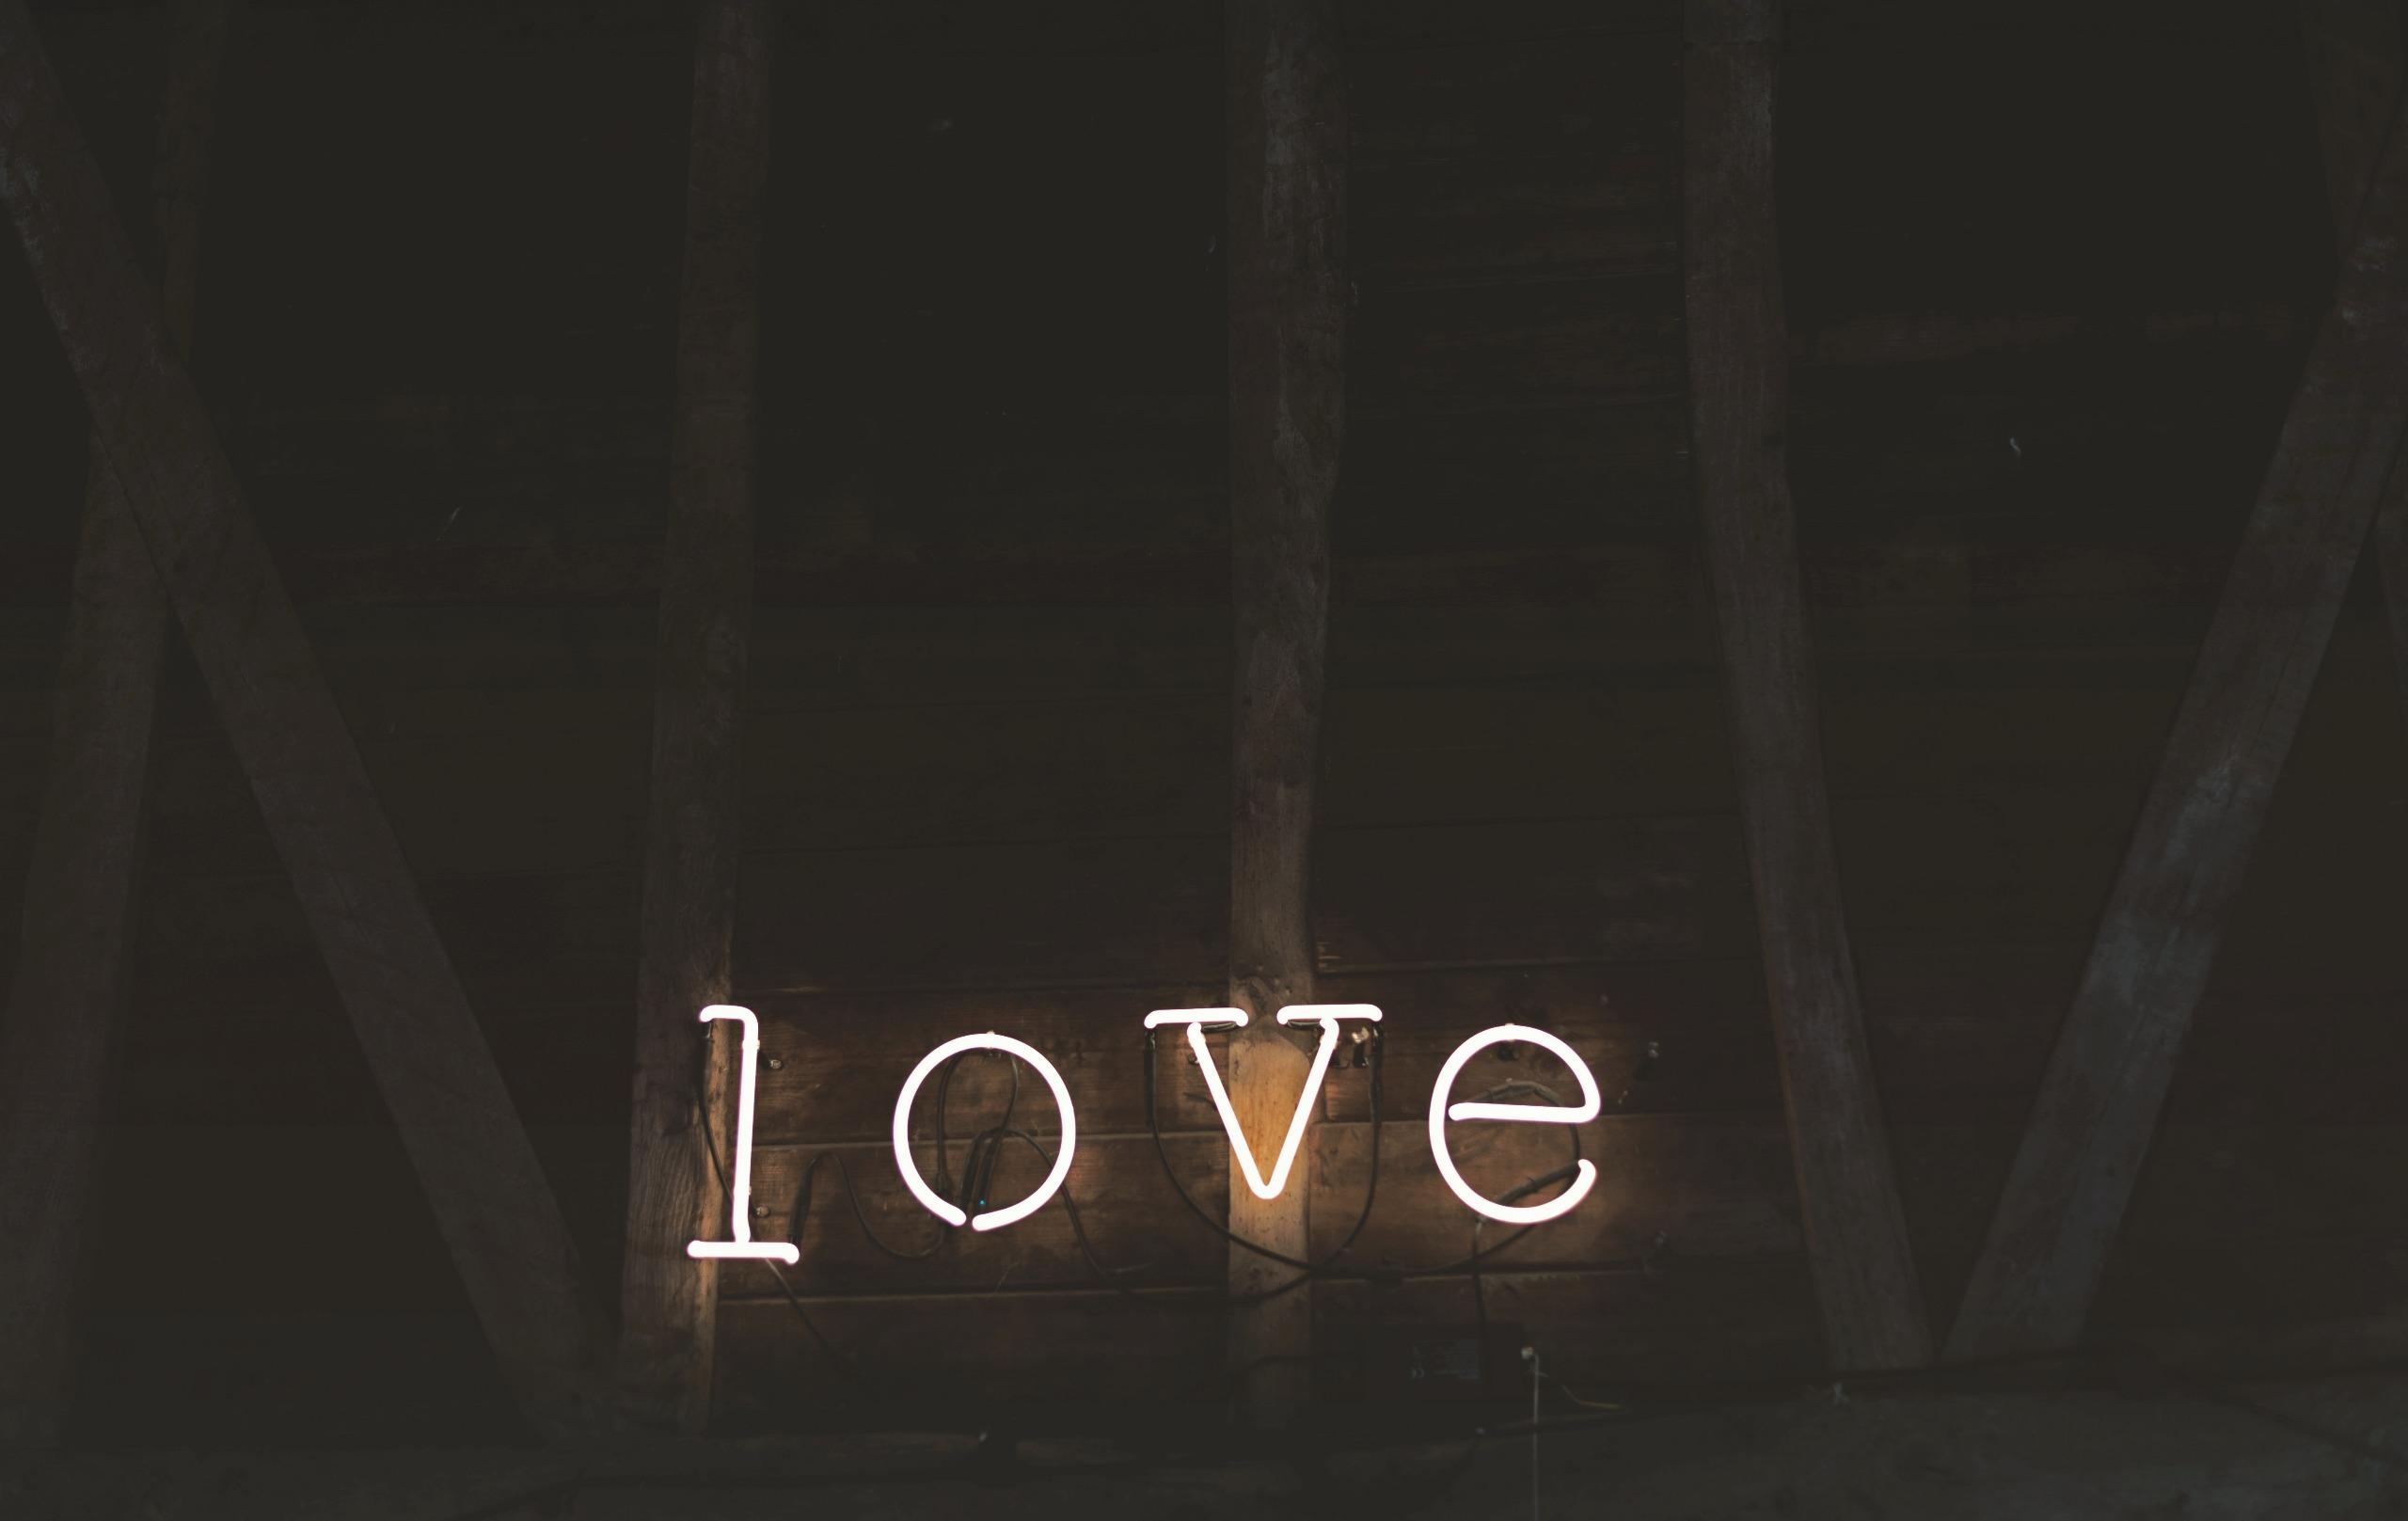 Courtesy of Unsplash (Public Domain)#FreeToEdit #love #billboard #light